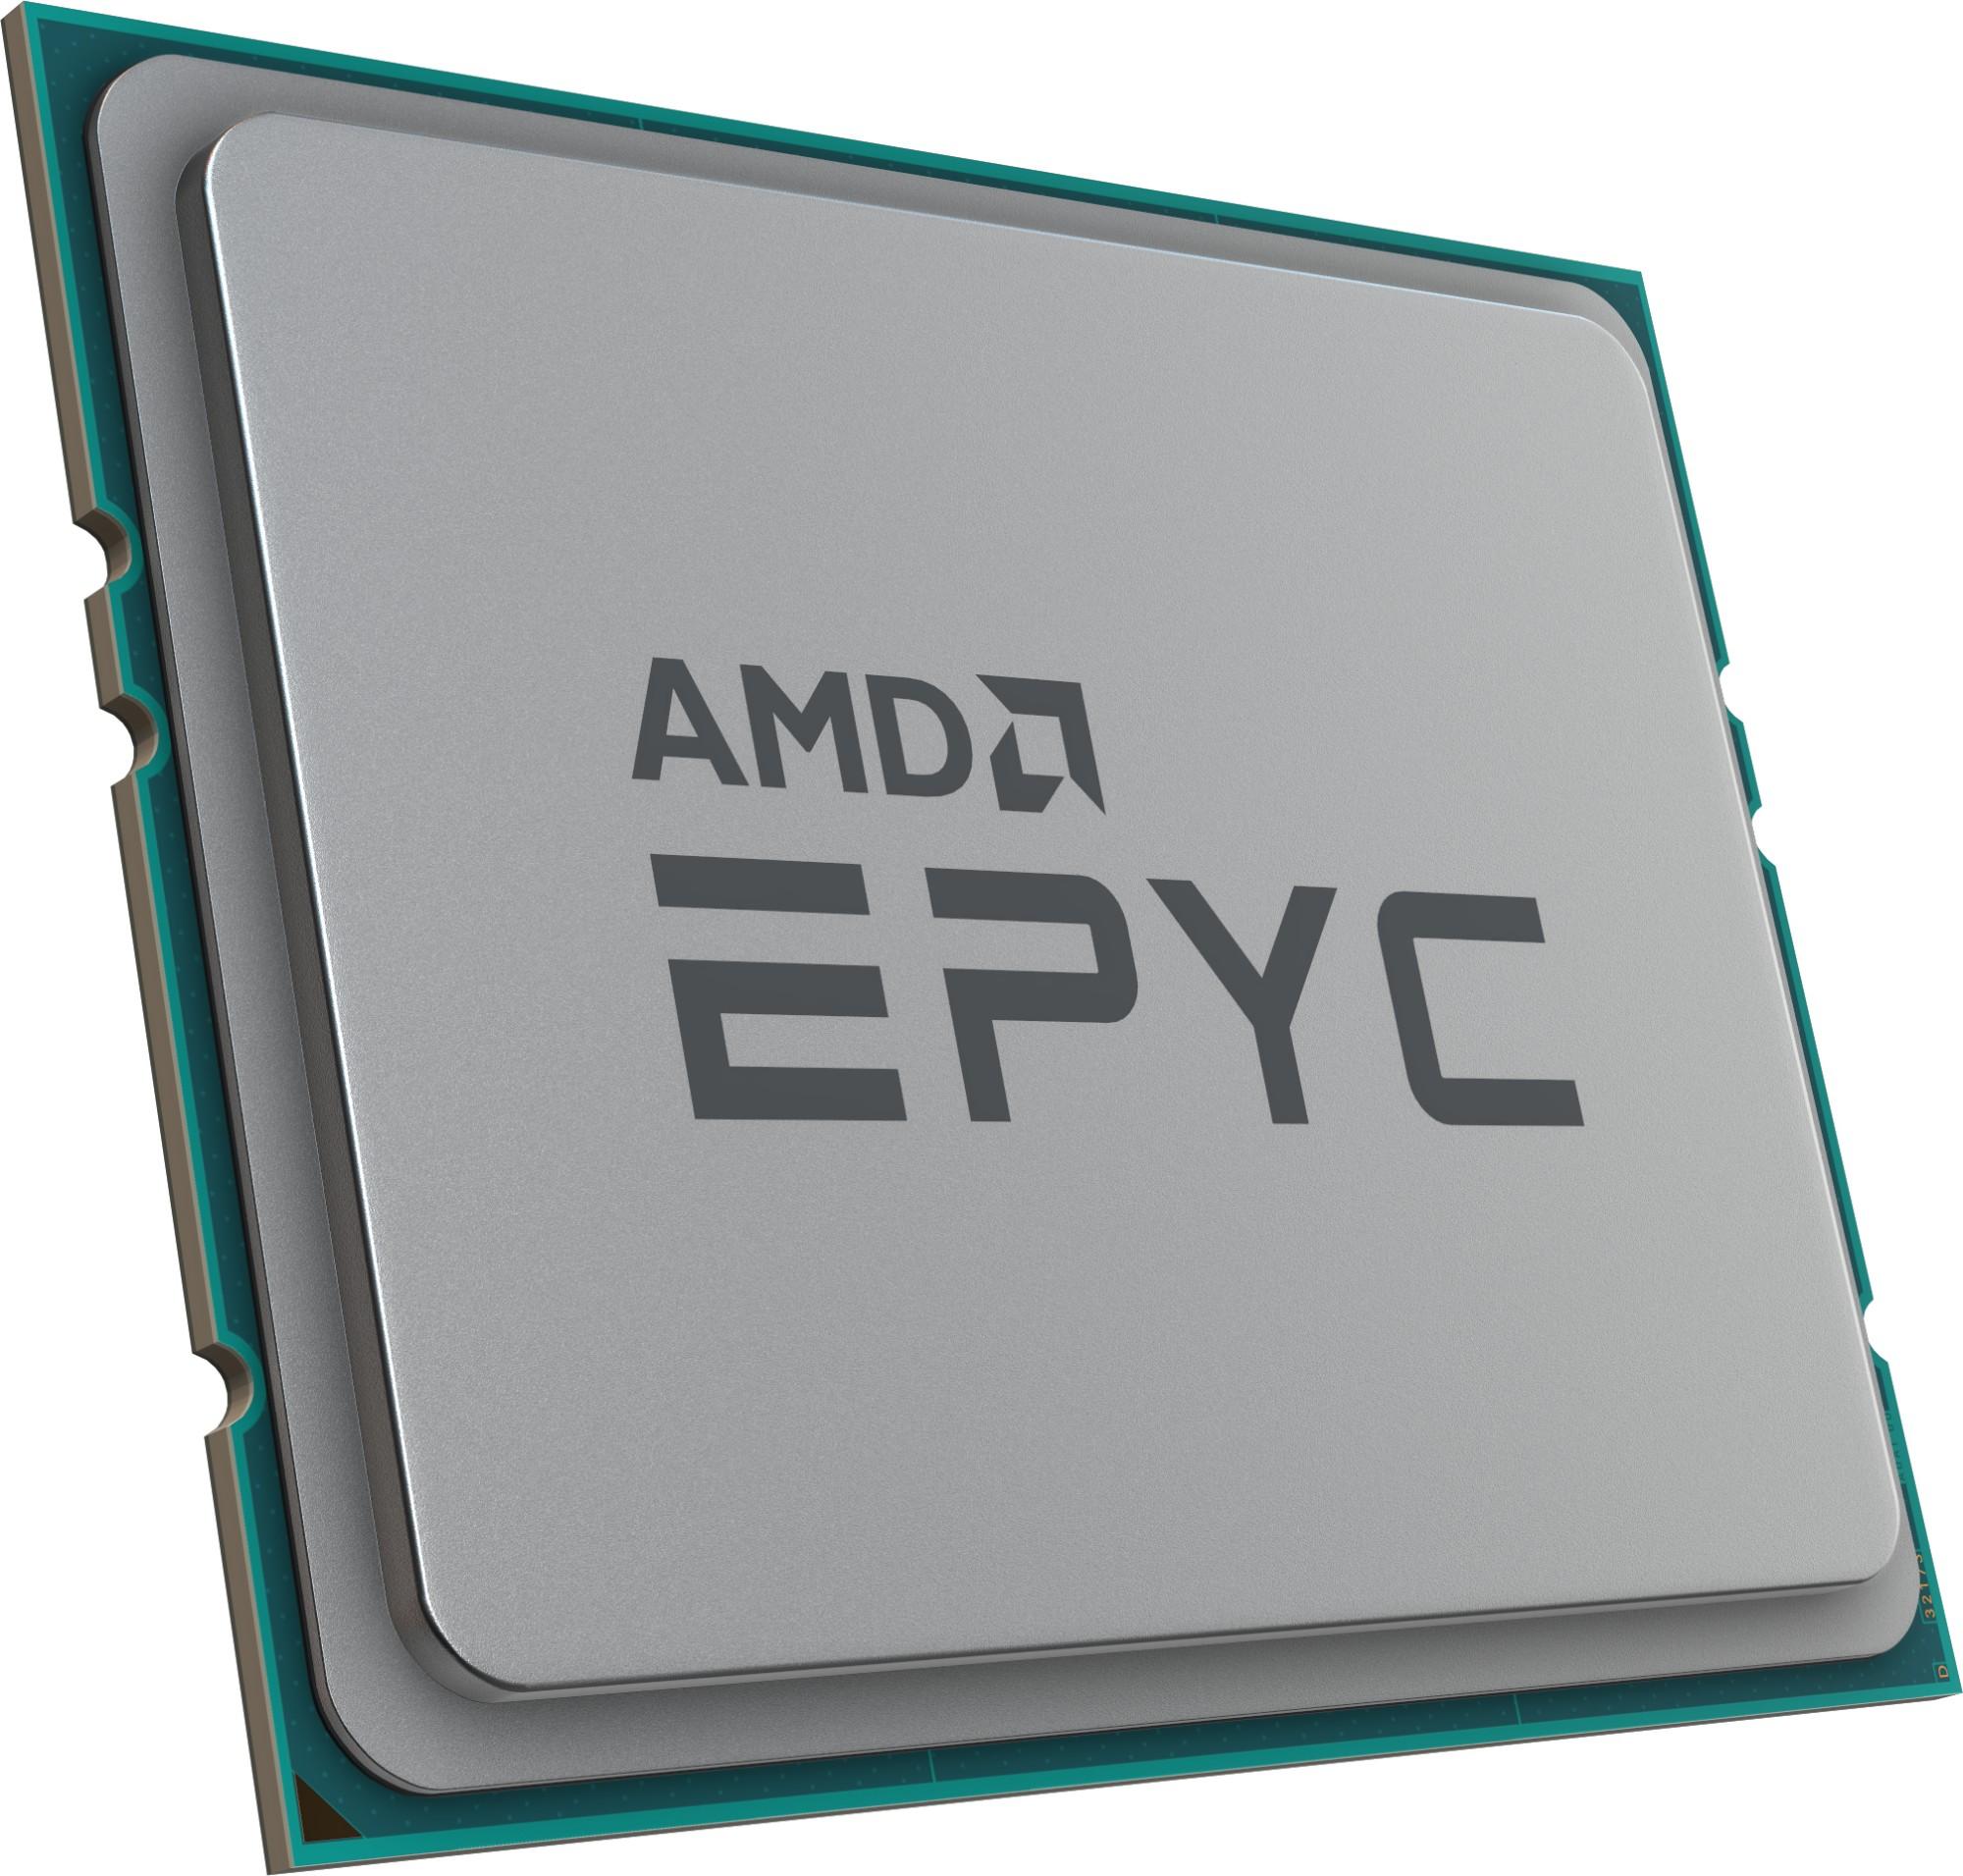 AMD EPYC 7552 processor 2.2 GHz 192 MB L3